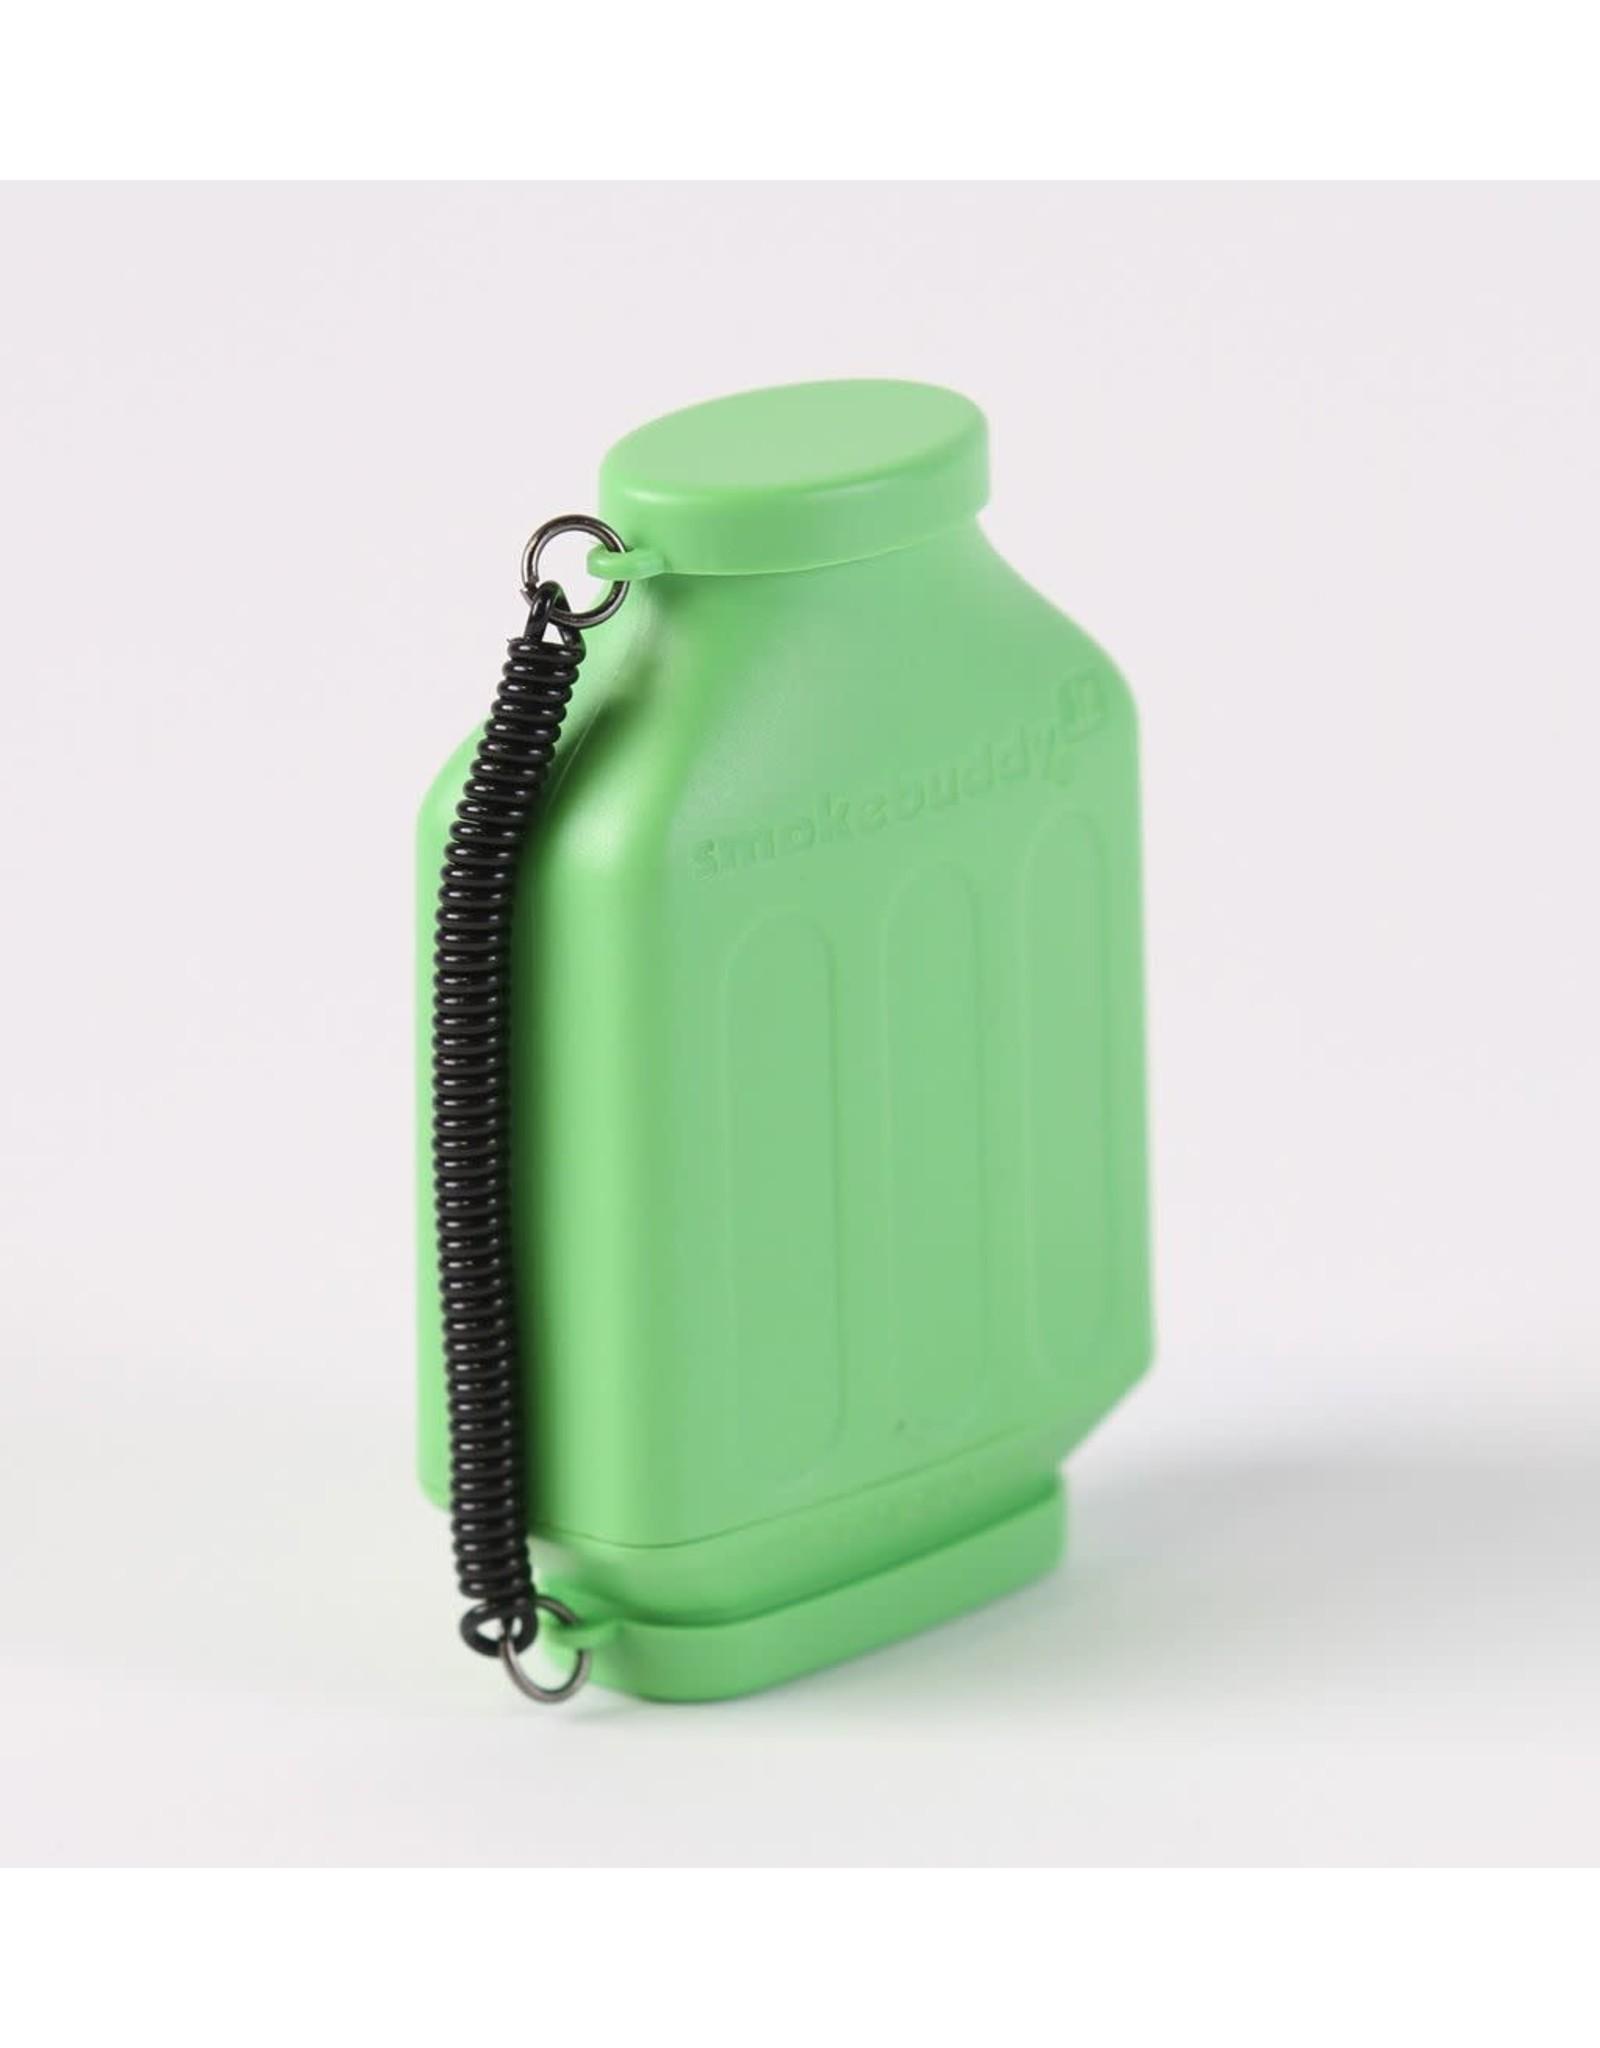 smoke buddy Lime Green Smokebuddy Junior Personal Air Filter